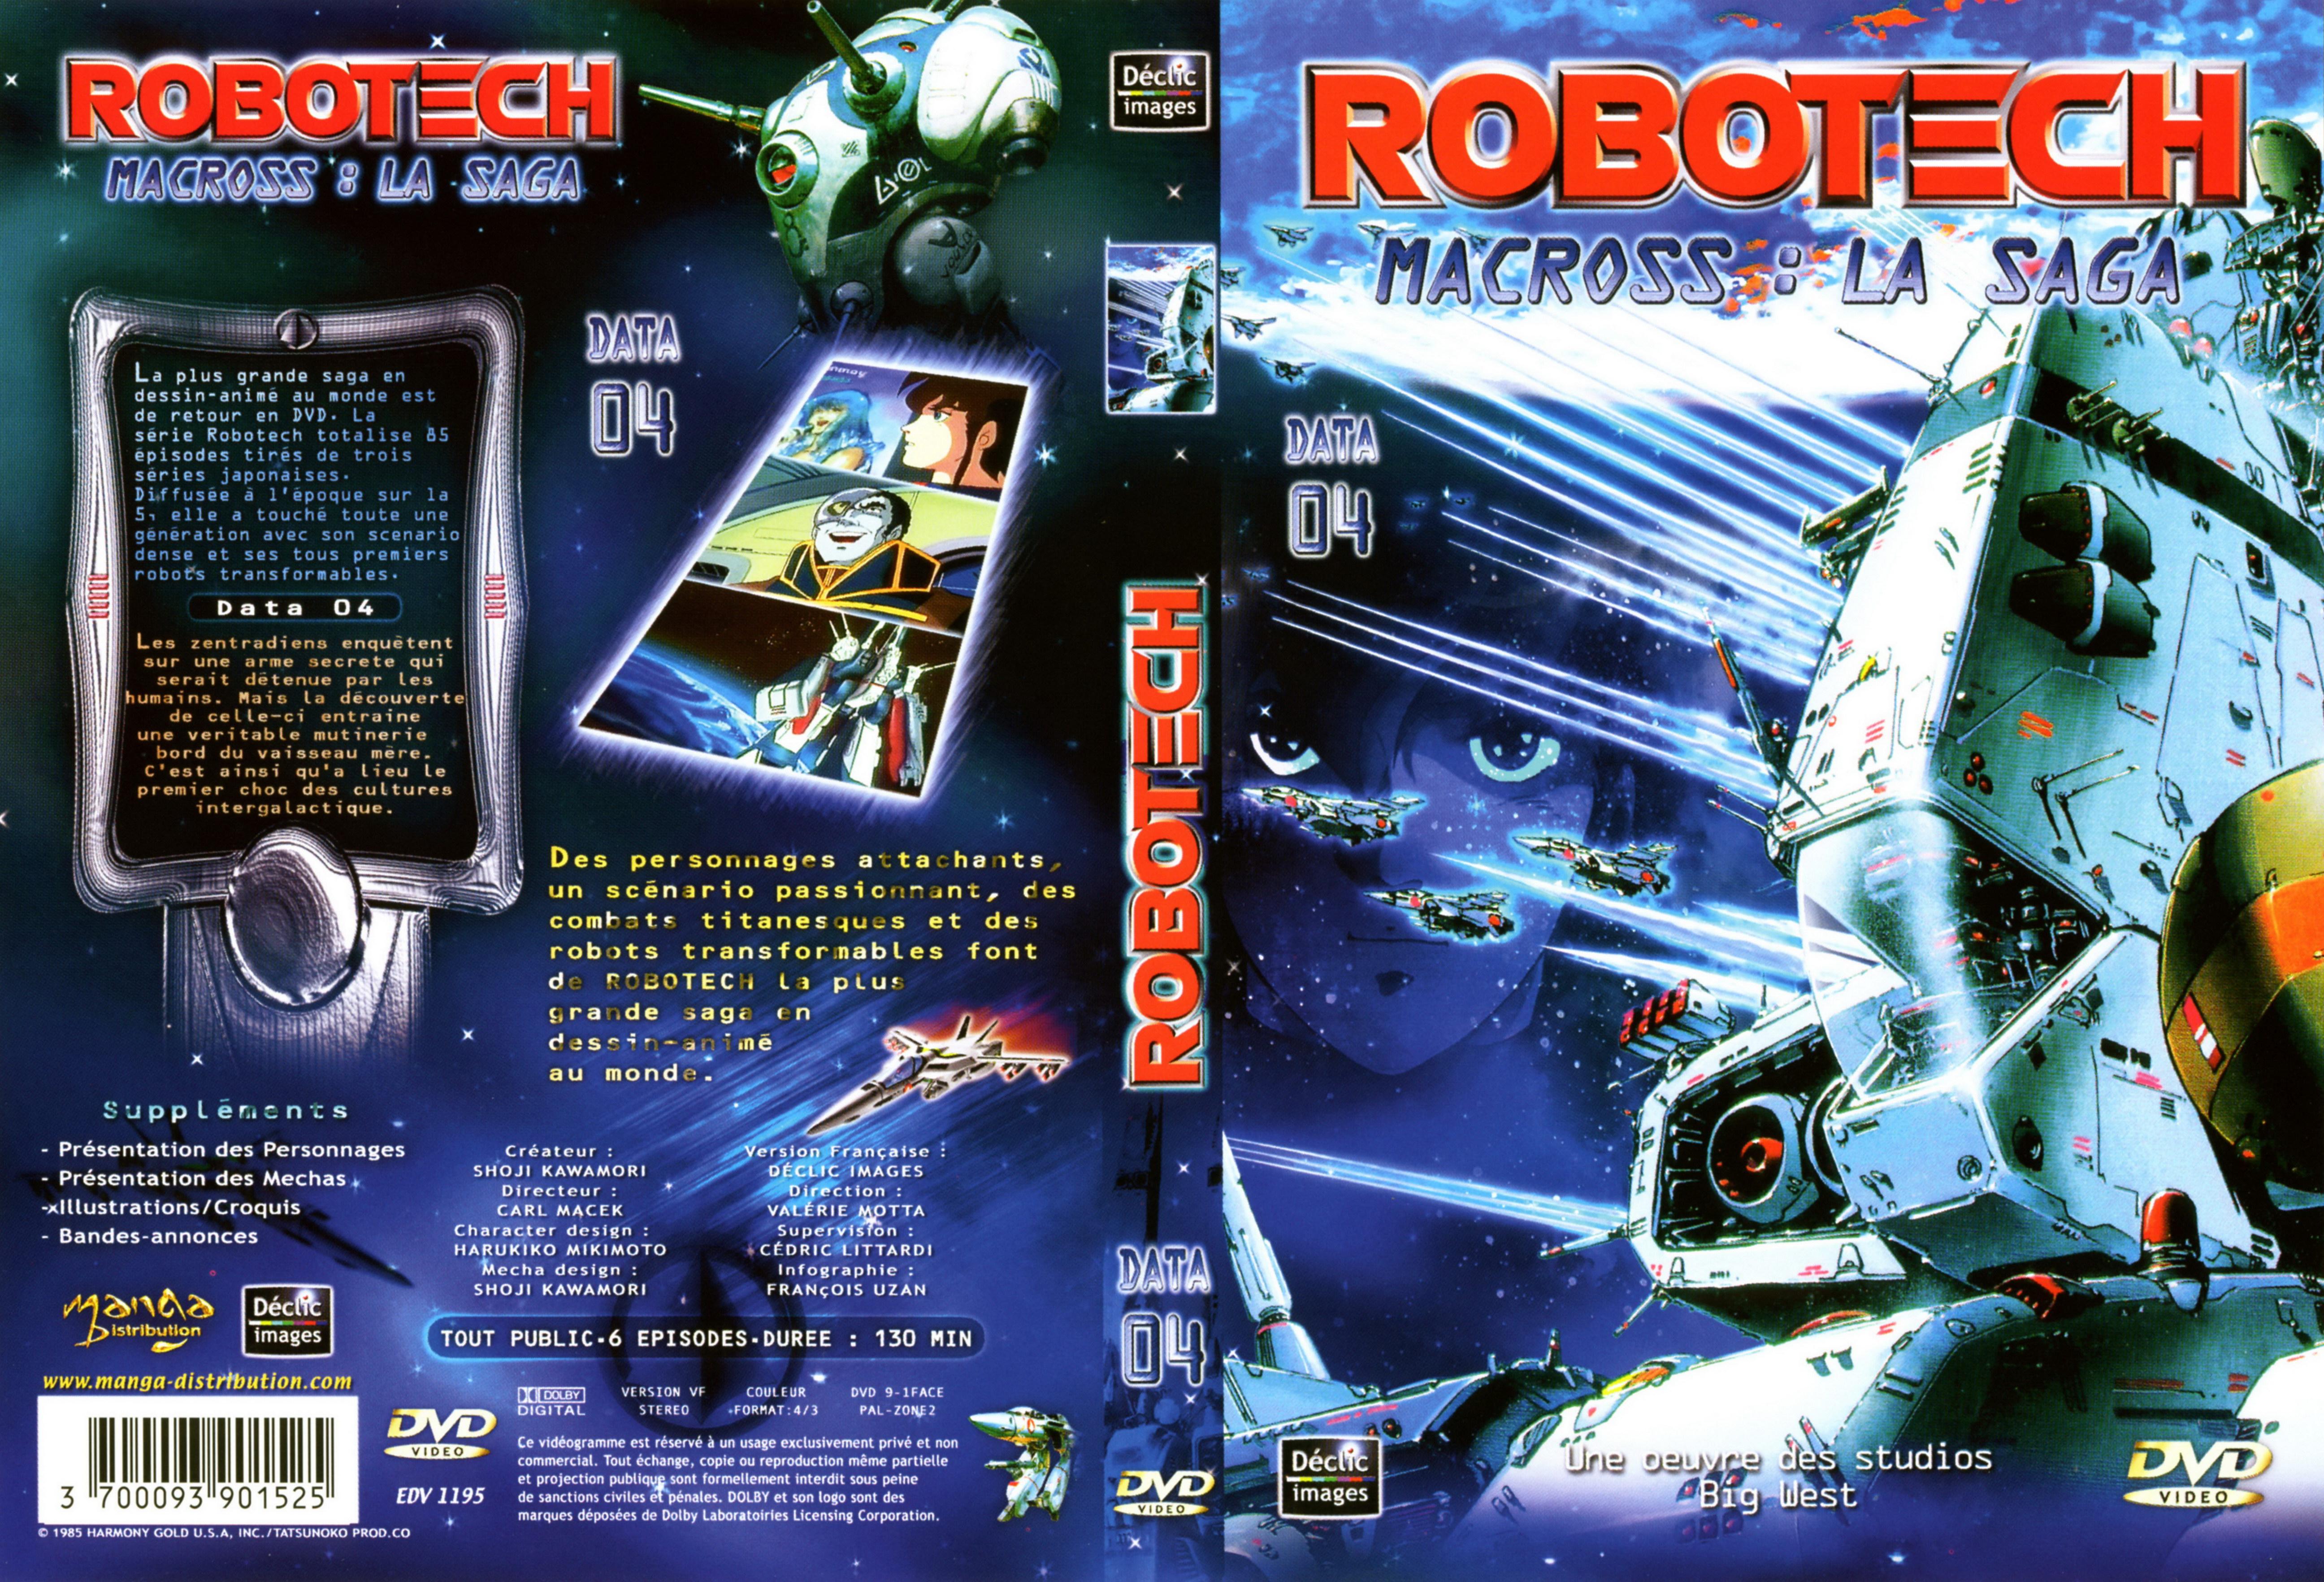 Macross Dvd Macross Saga Robotech Dvd